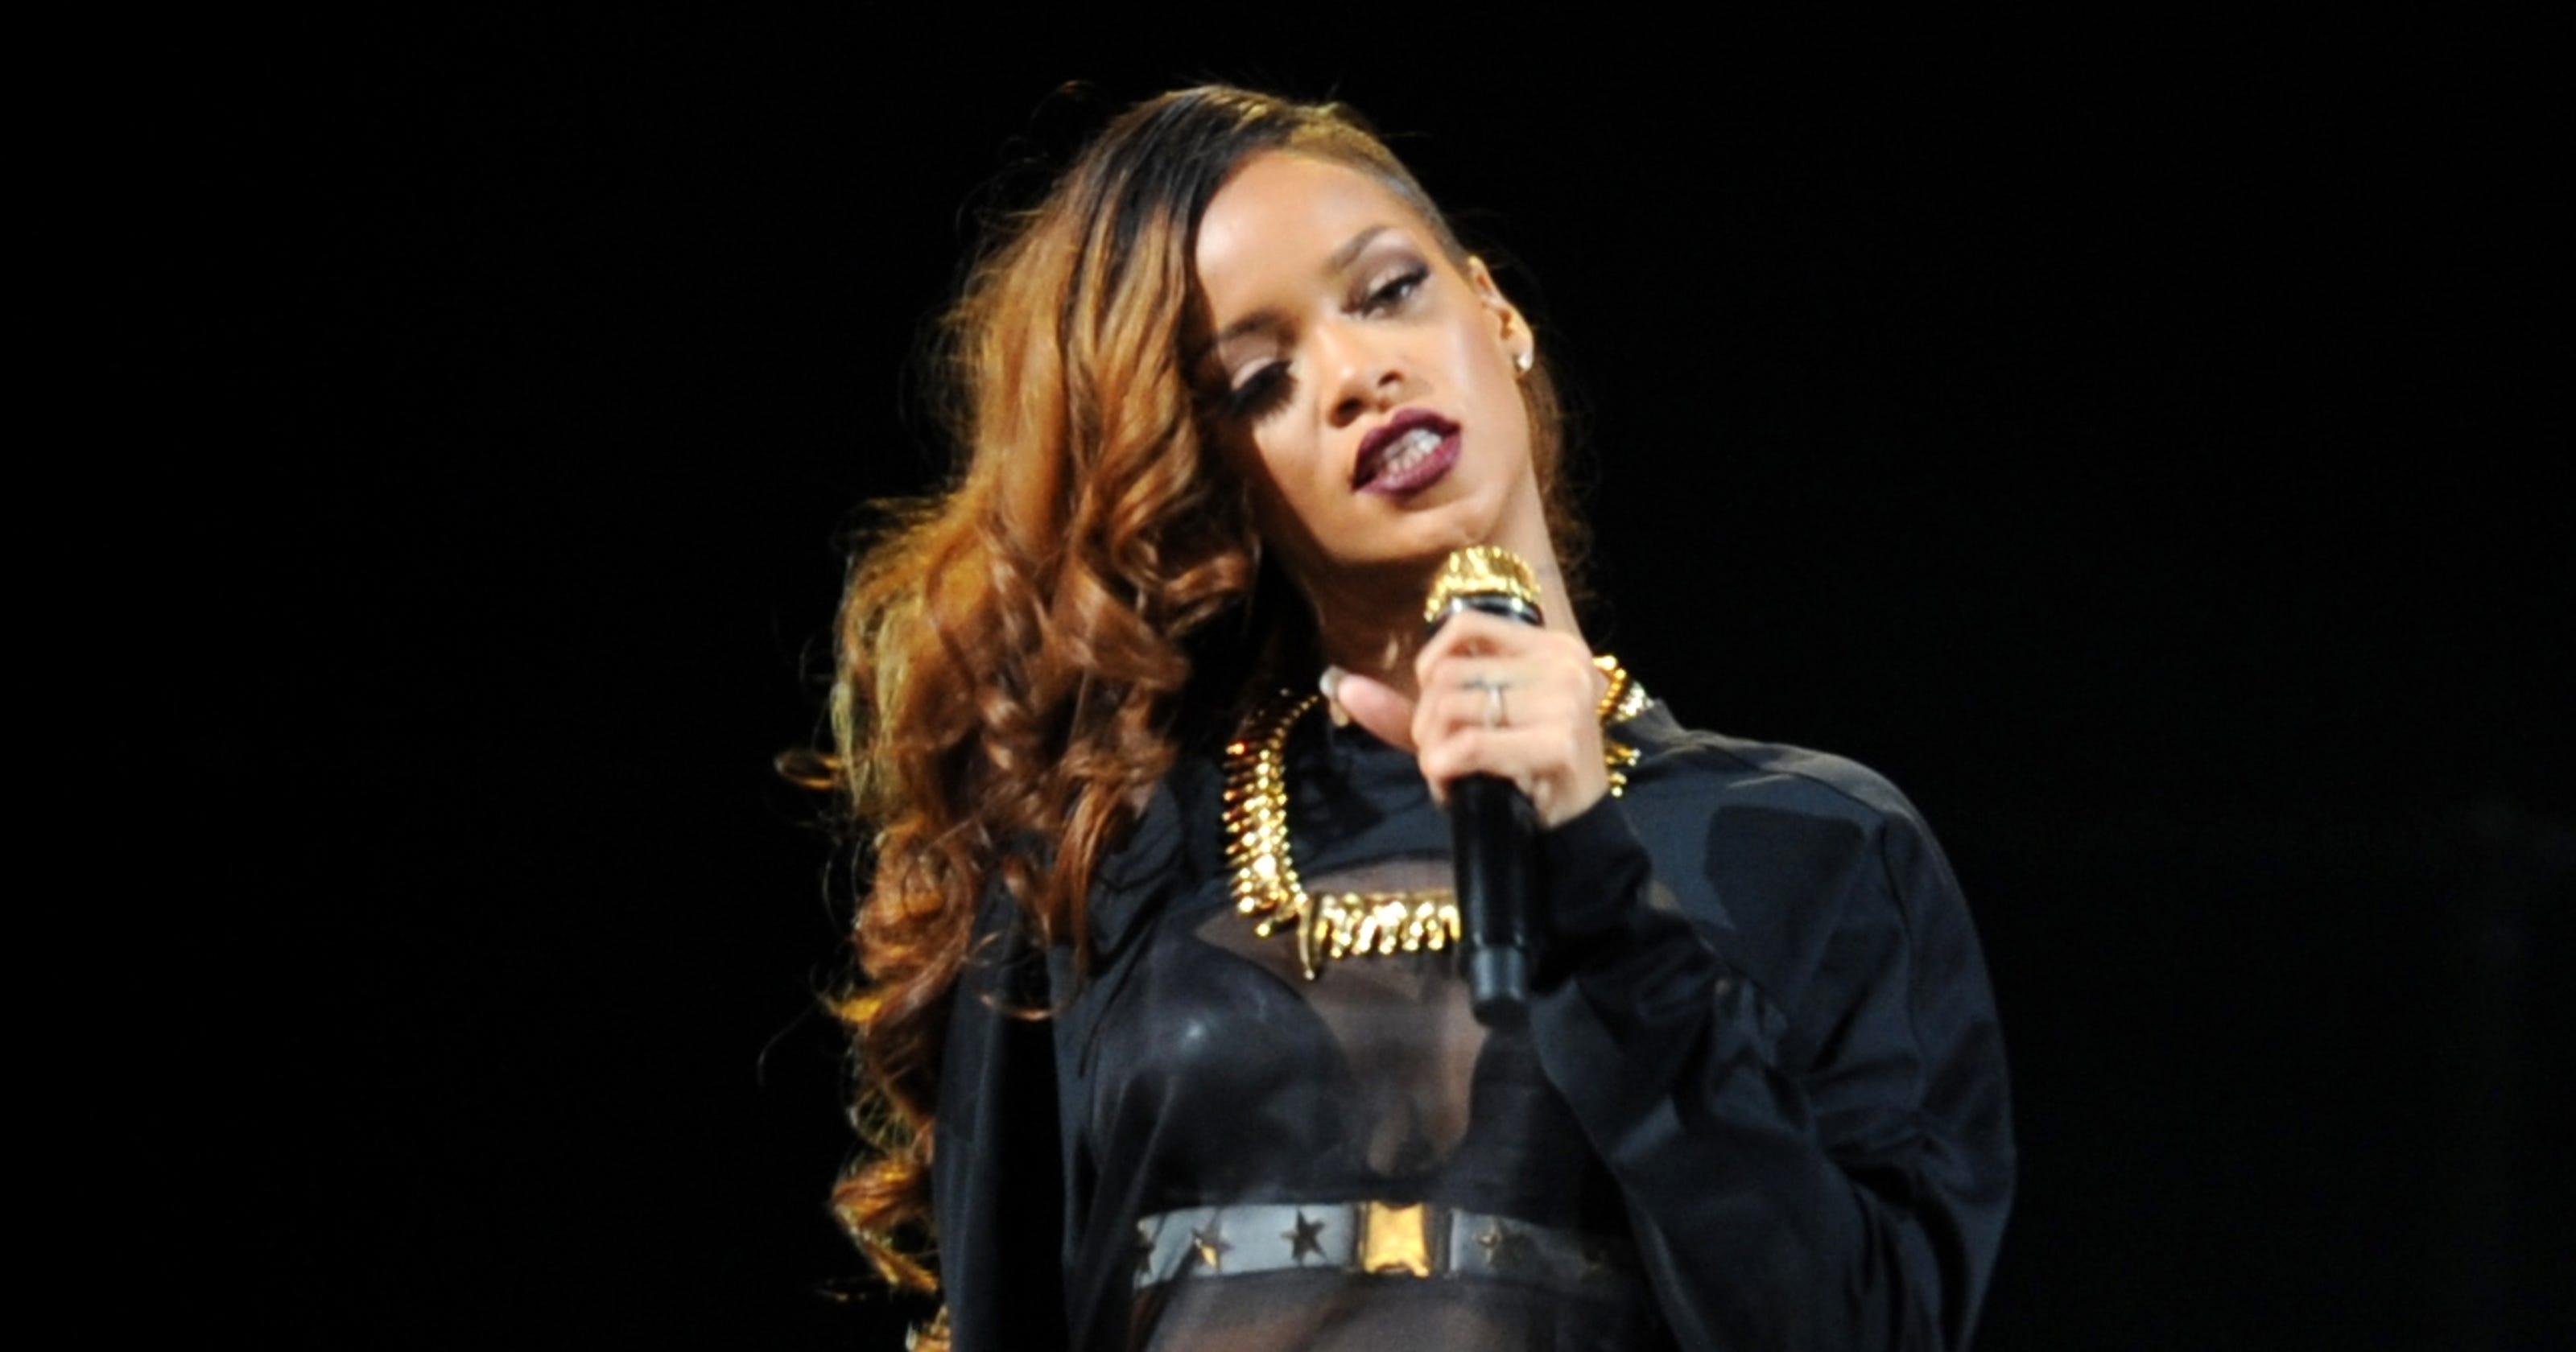 Rihanna cancels Houston concert because of illness